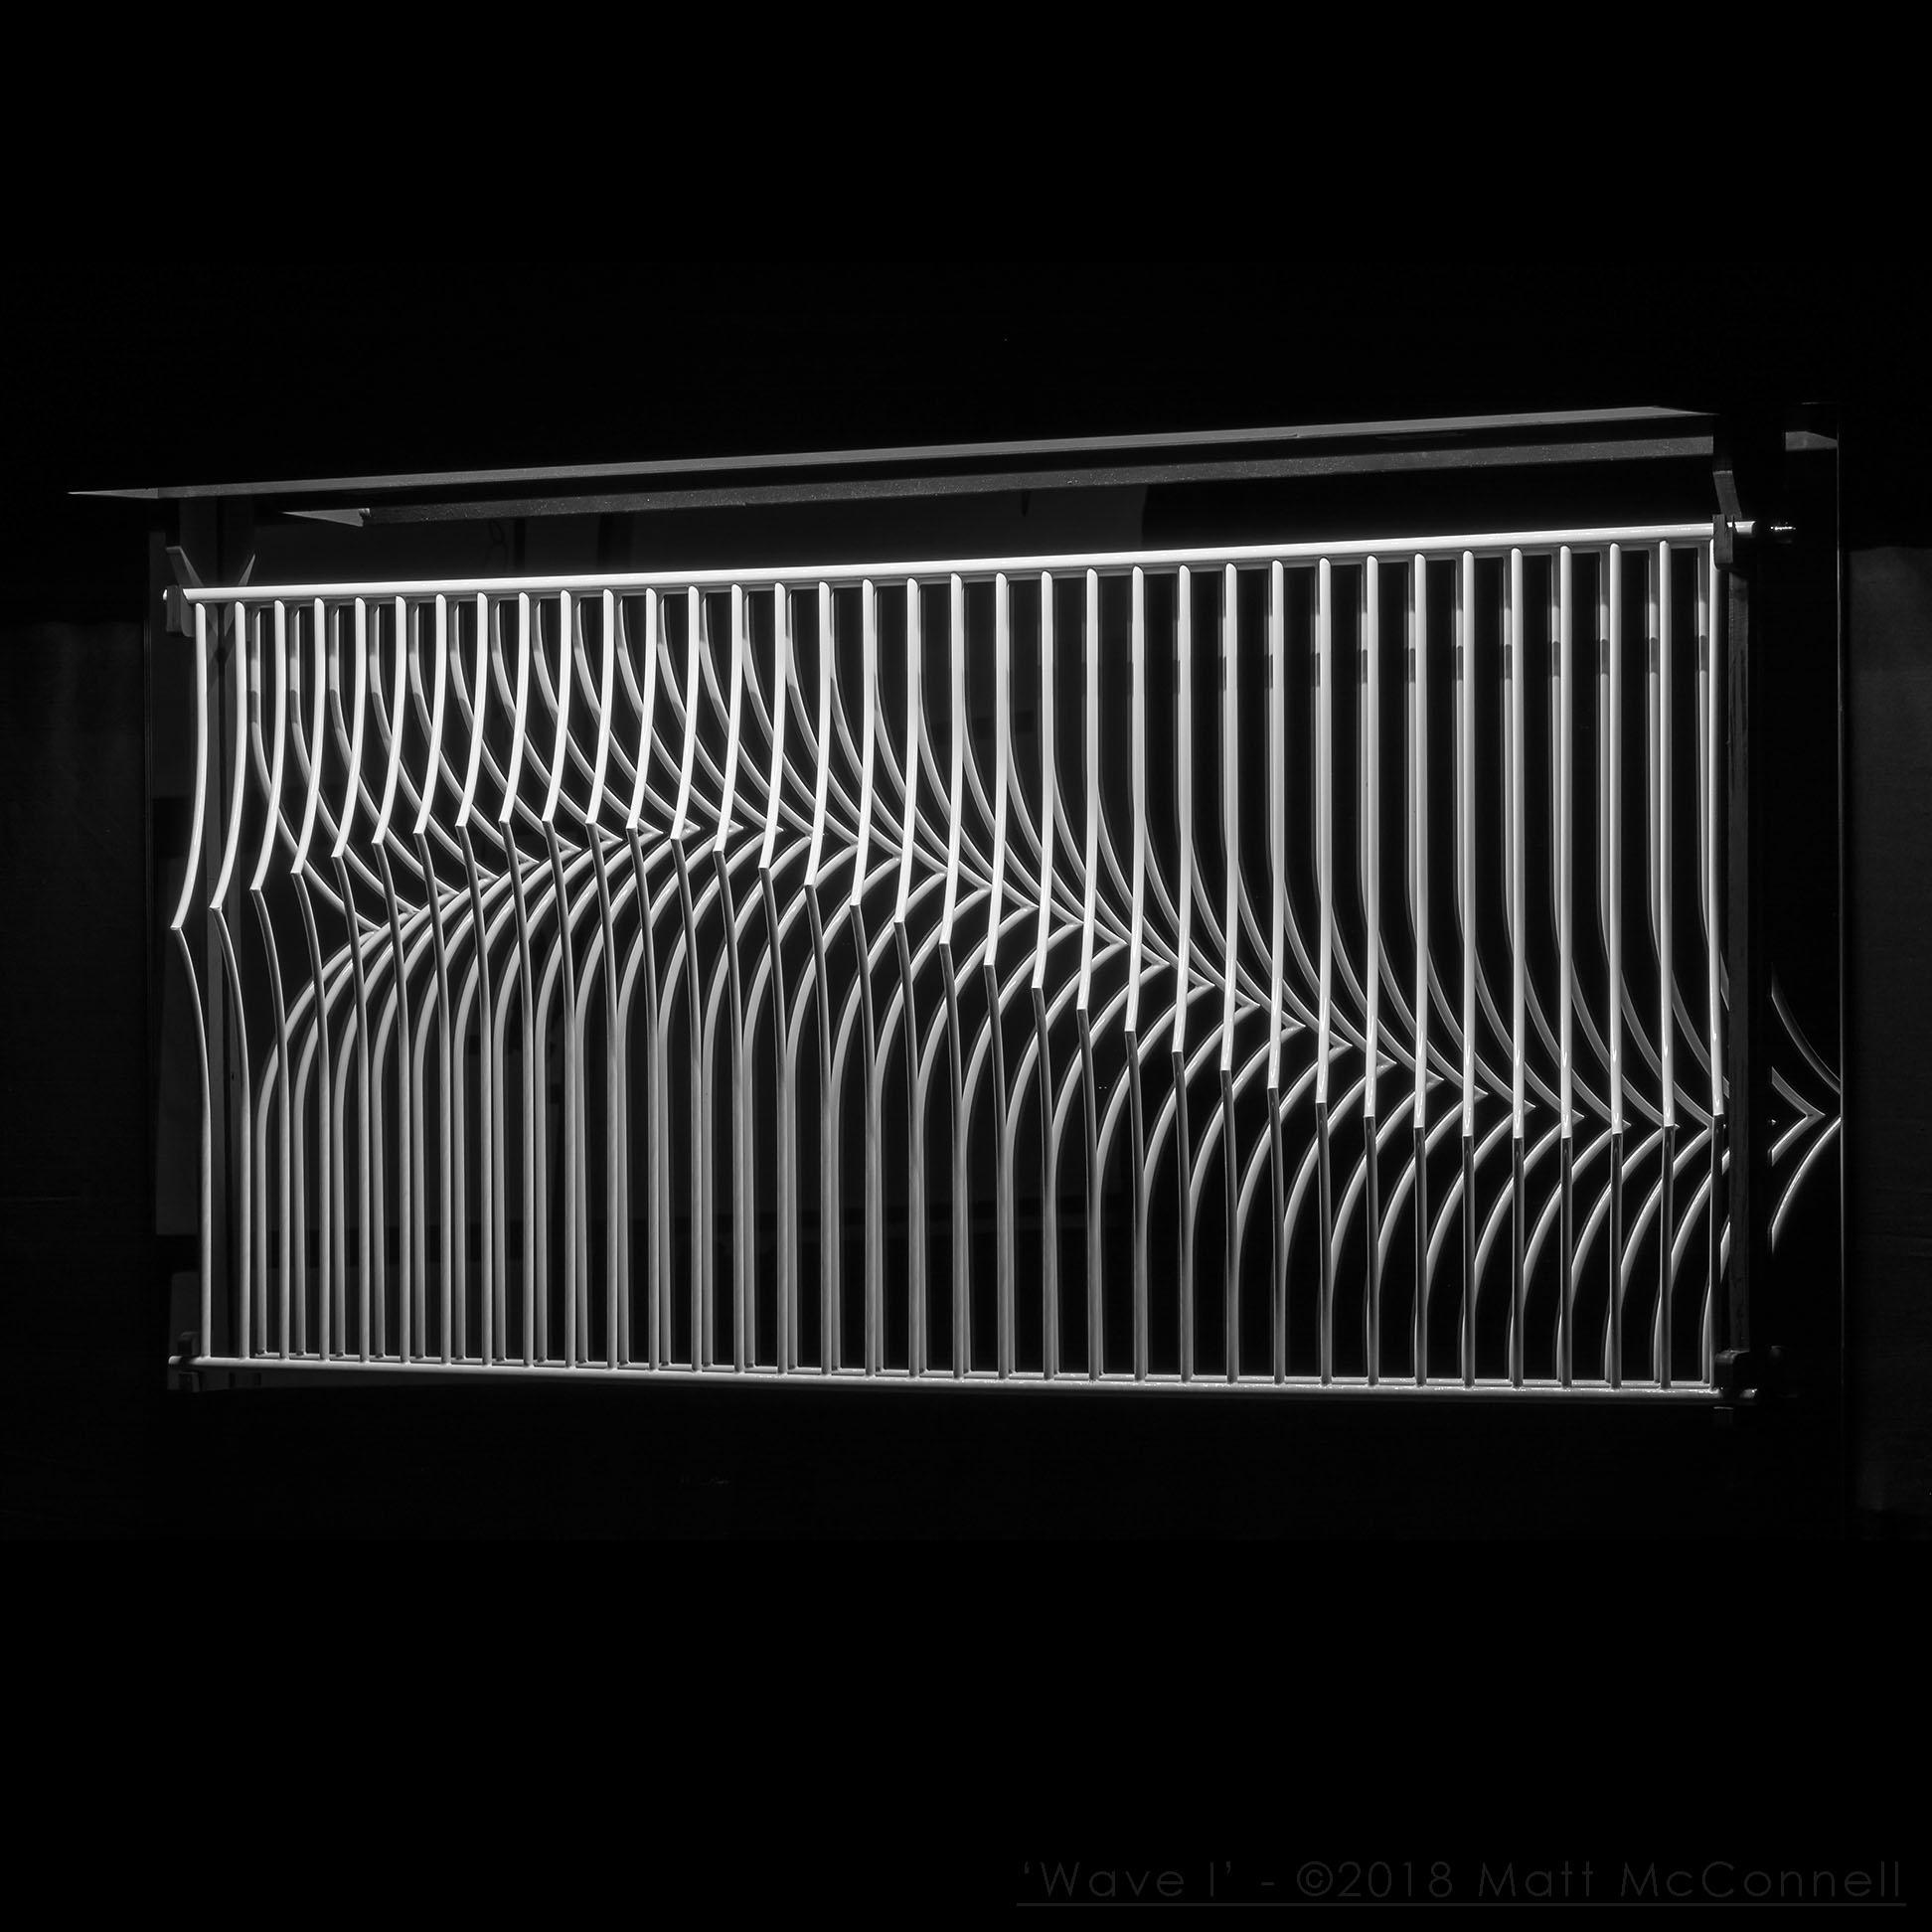 'Wave I-©2018 Matt McConnell - 02.jpg